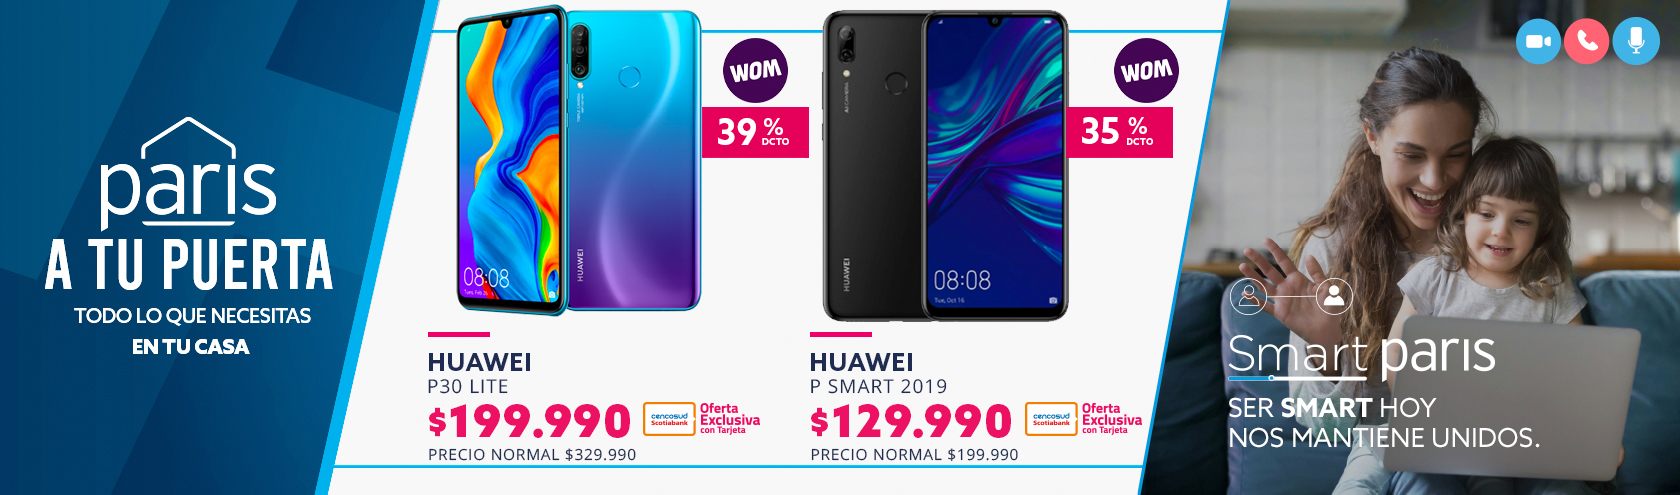 Ofertas Smartphone Huawei y Samsung